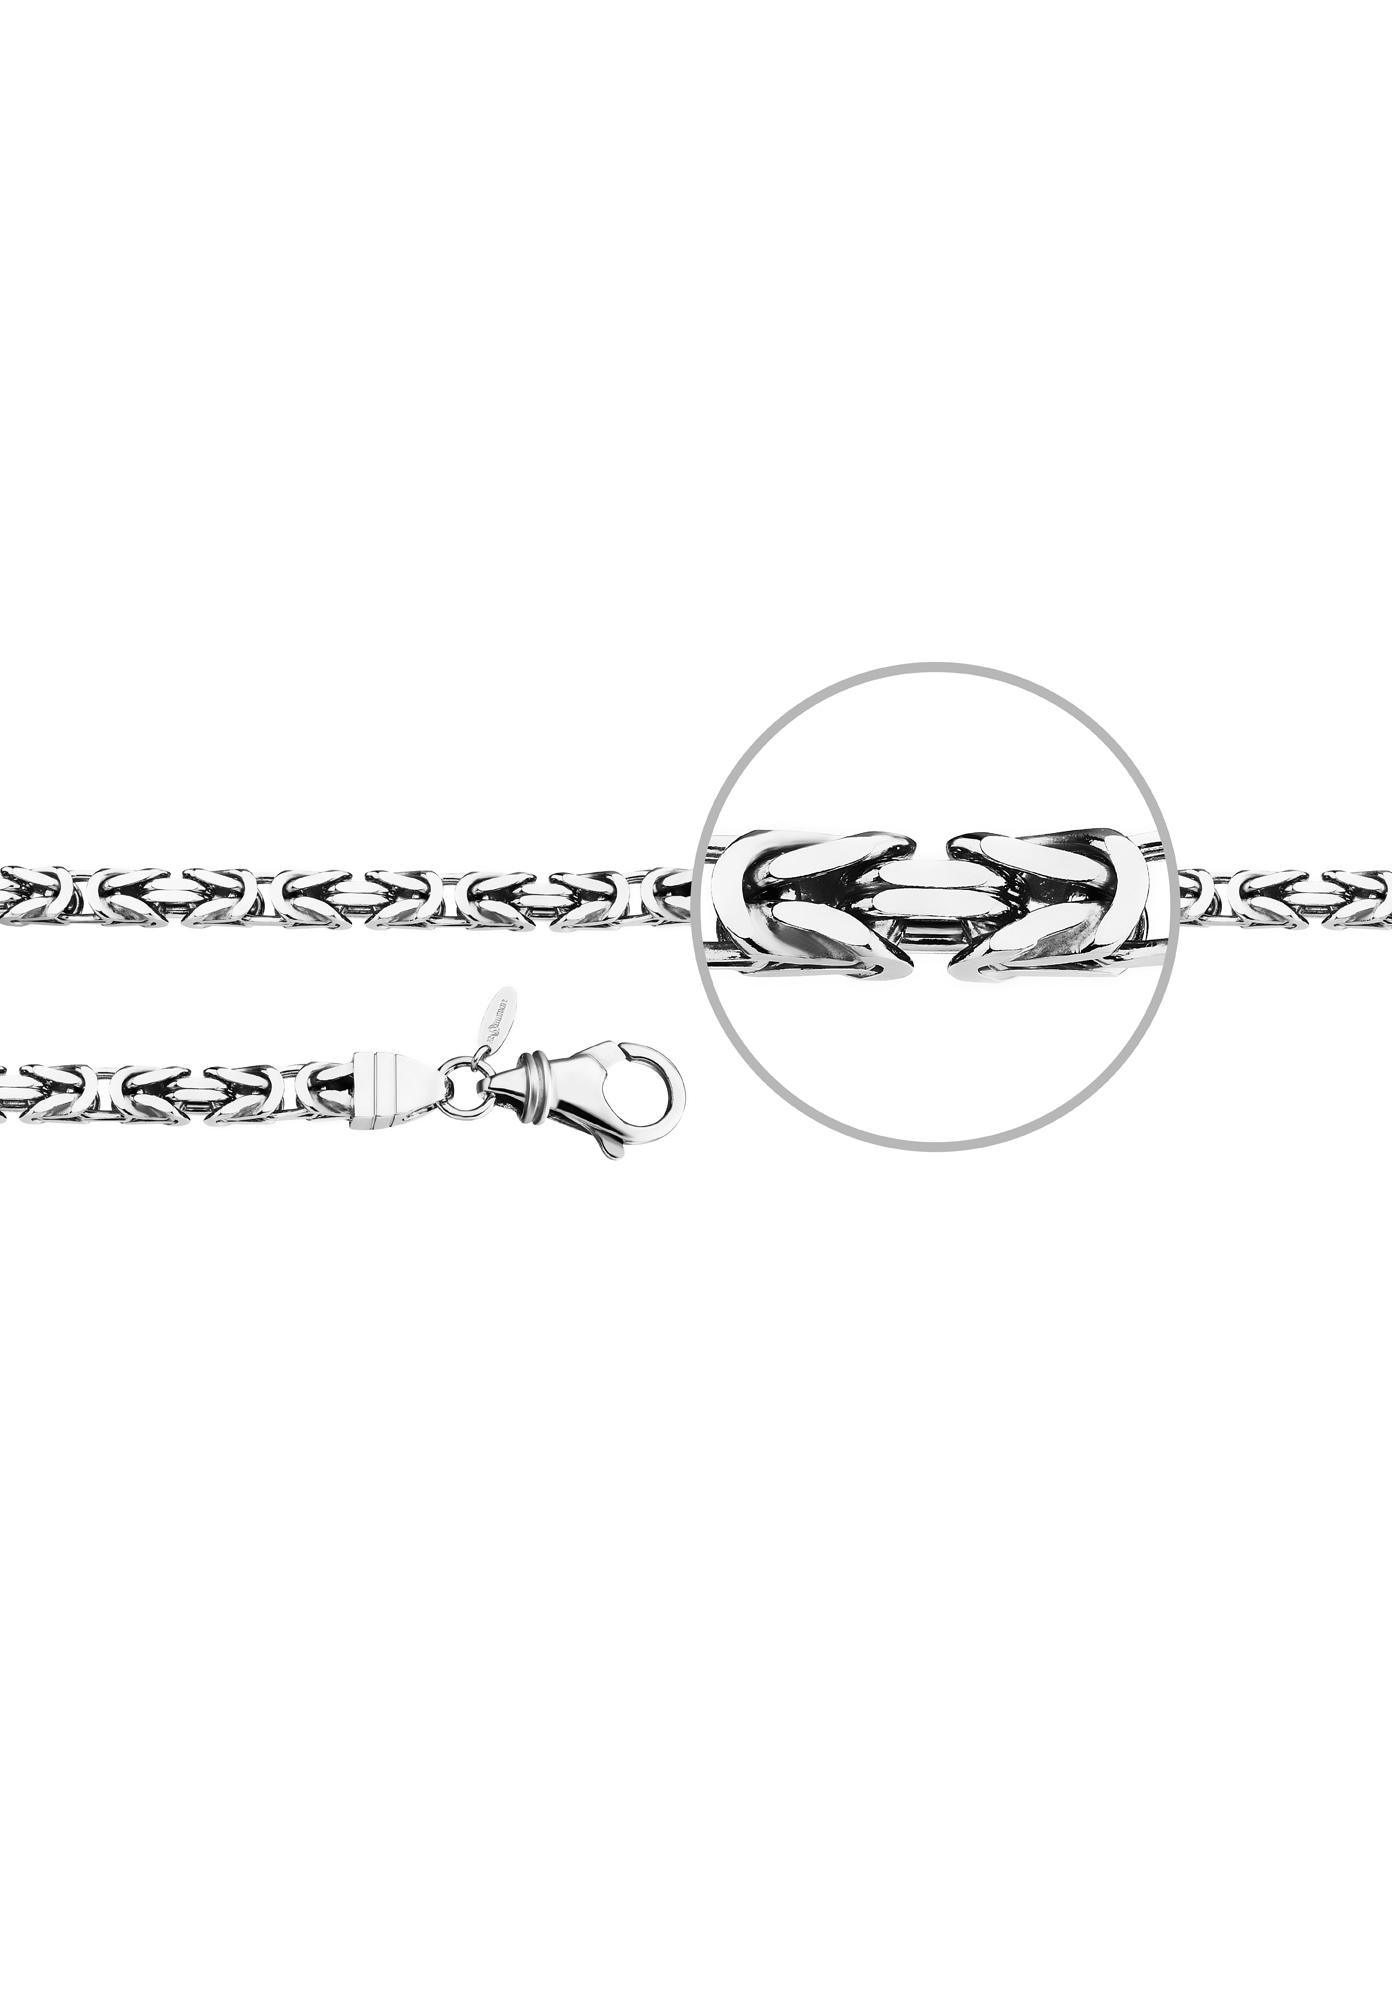 Der Kettenmacher Königsarmband KÖ5-21S, KÖ5-23S günstig online kaufen